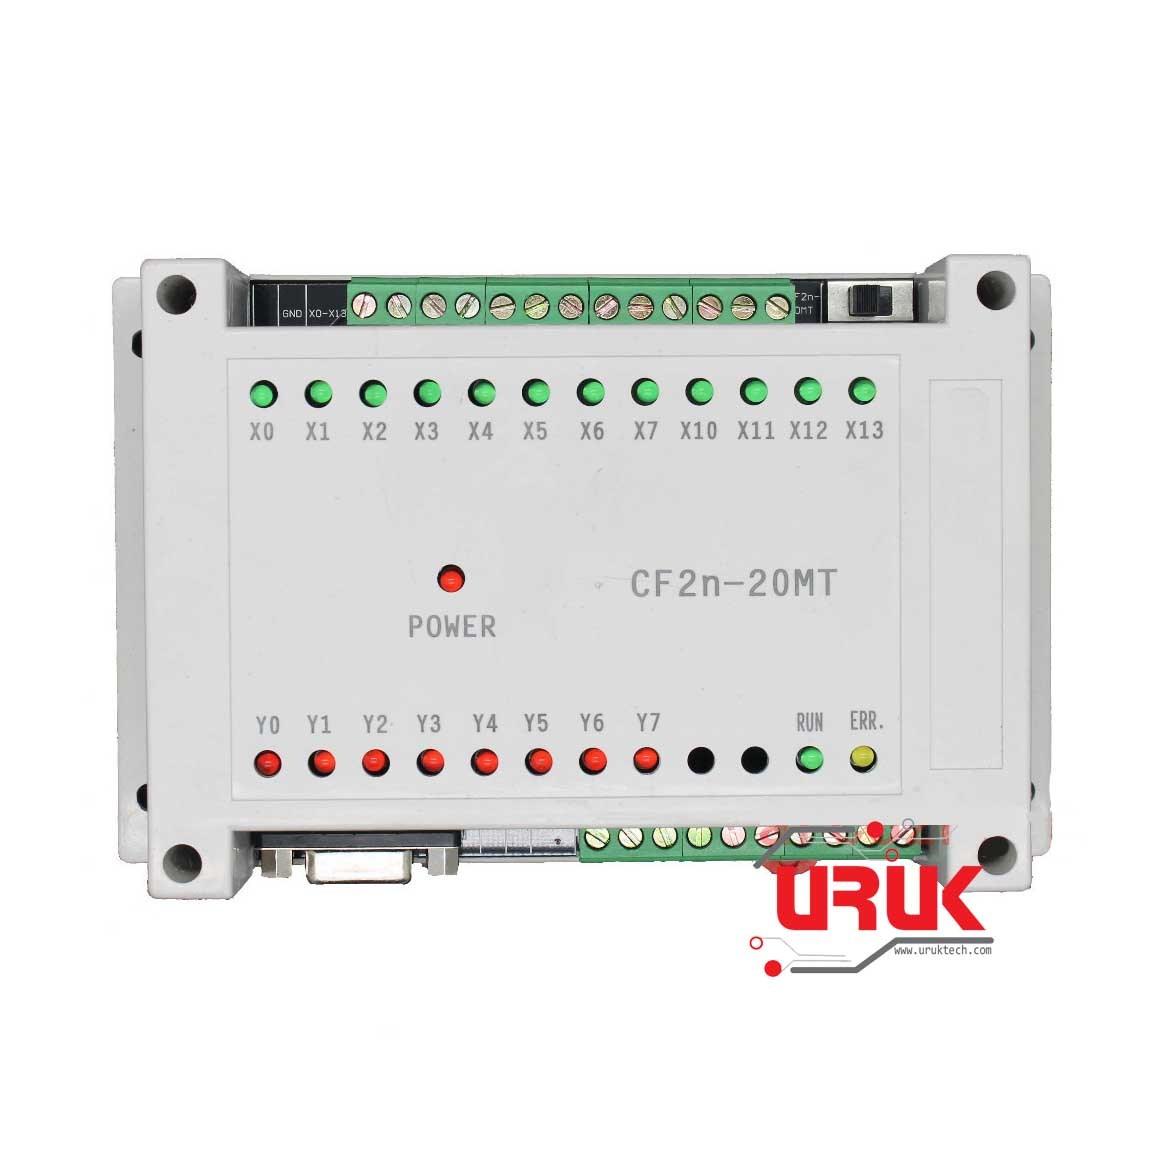 Wz 0847  Mitsubishi Plc Fx Series Communication With